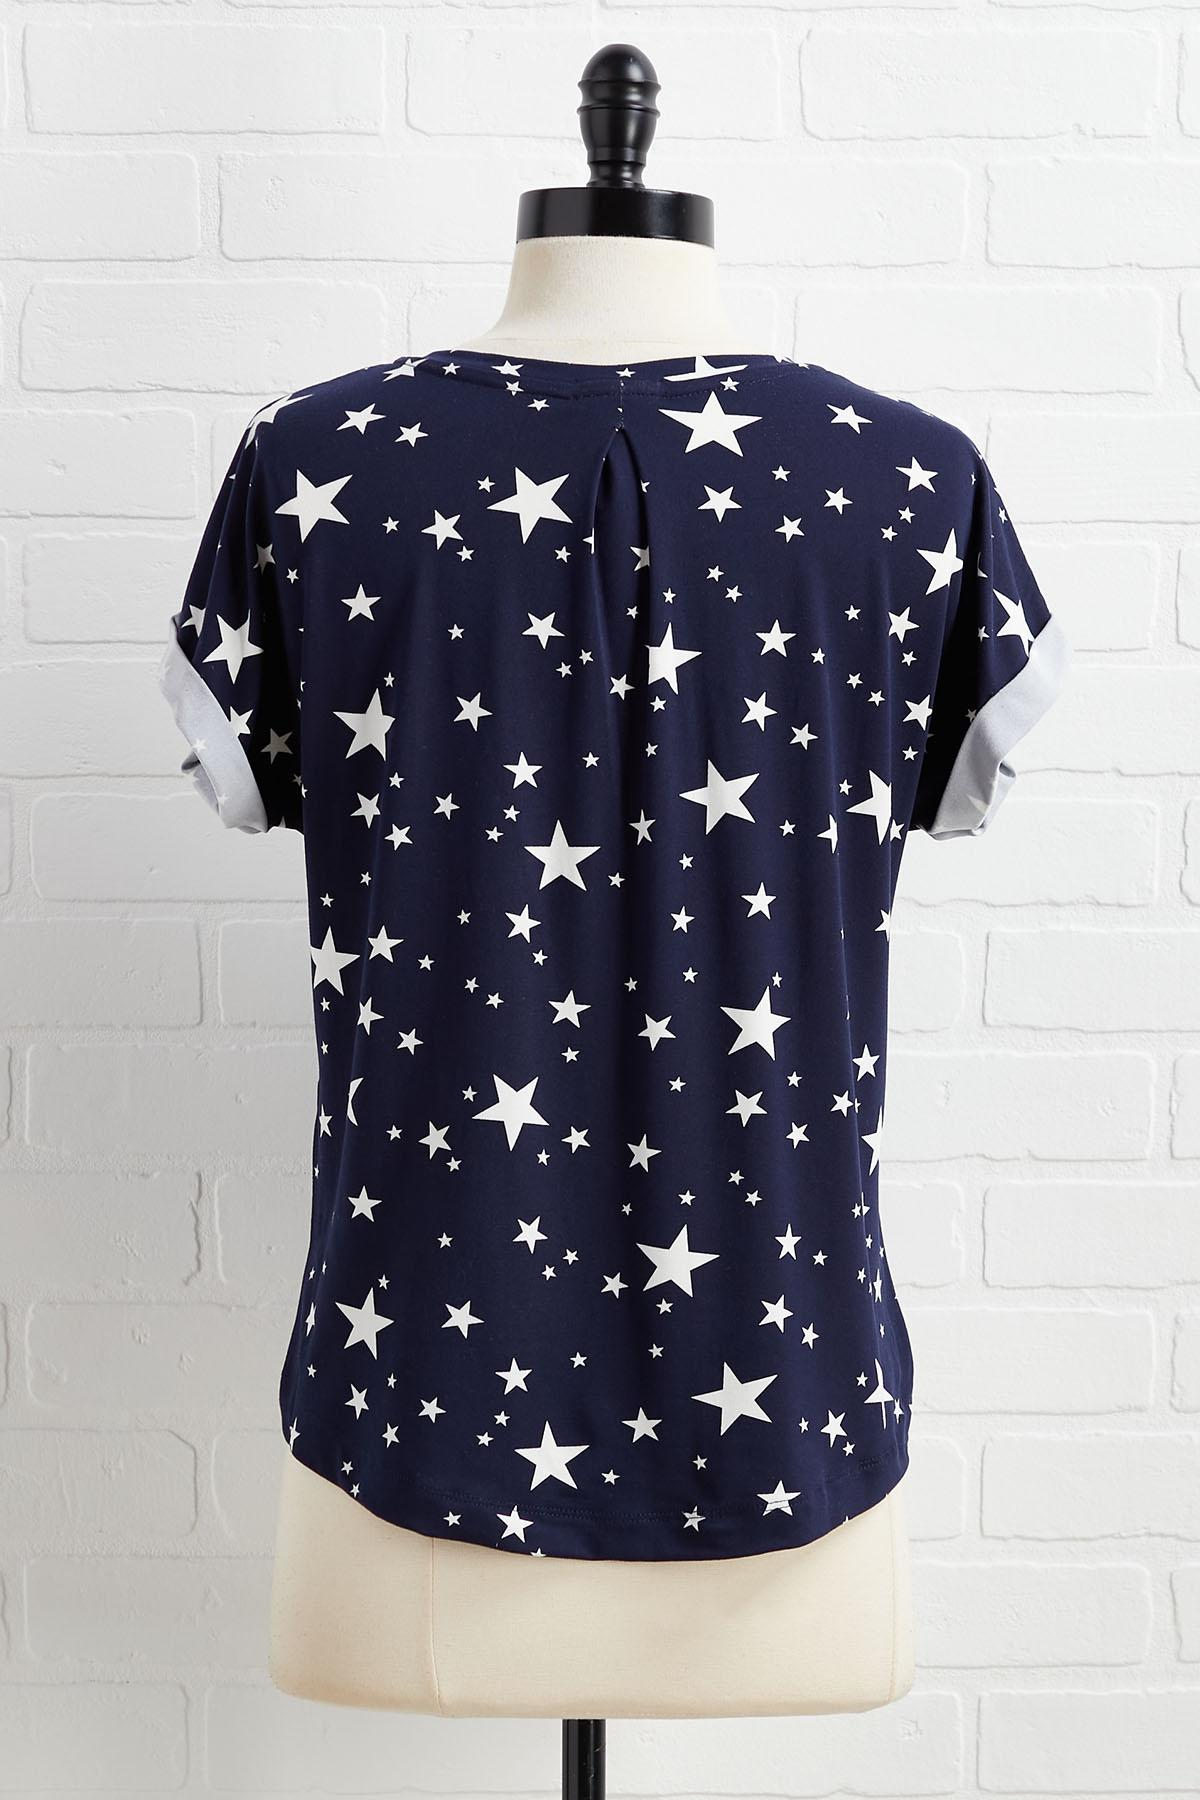 Star Studded Top